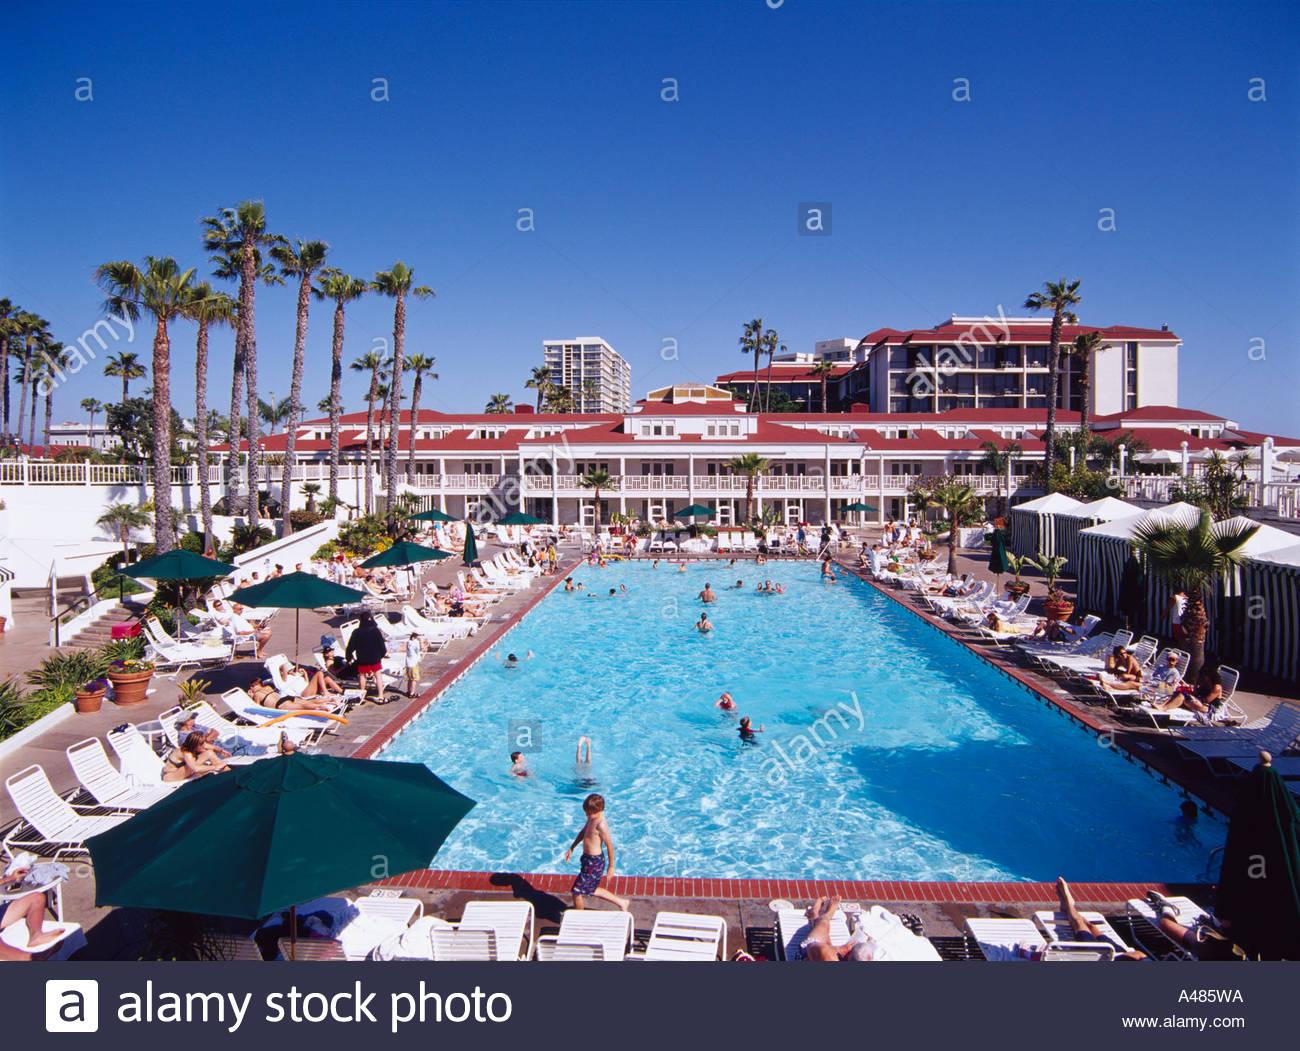 coronado hotel san diego california america blue sky pool parasol